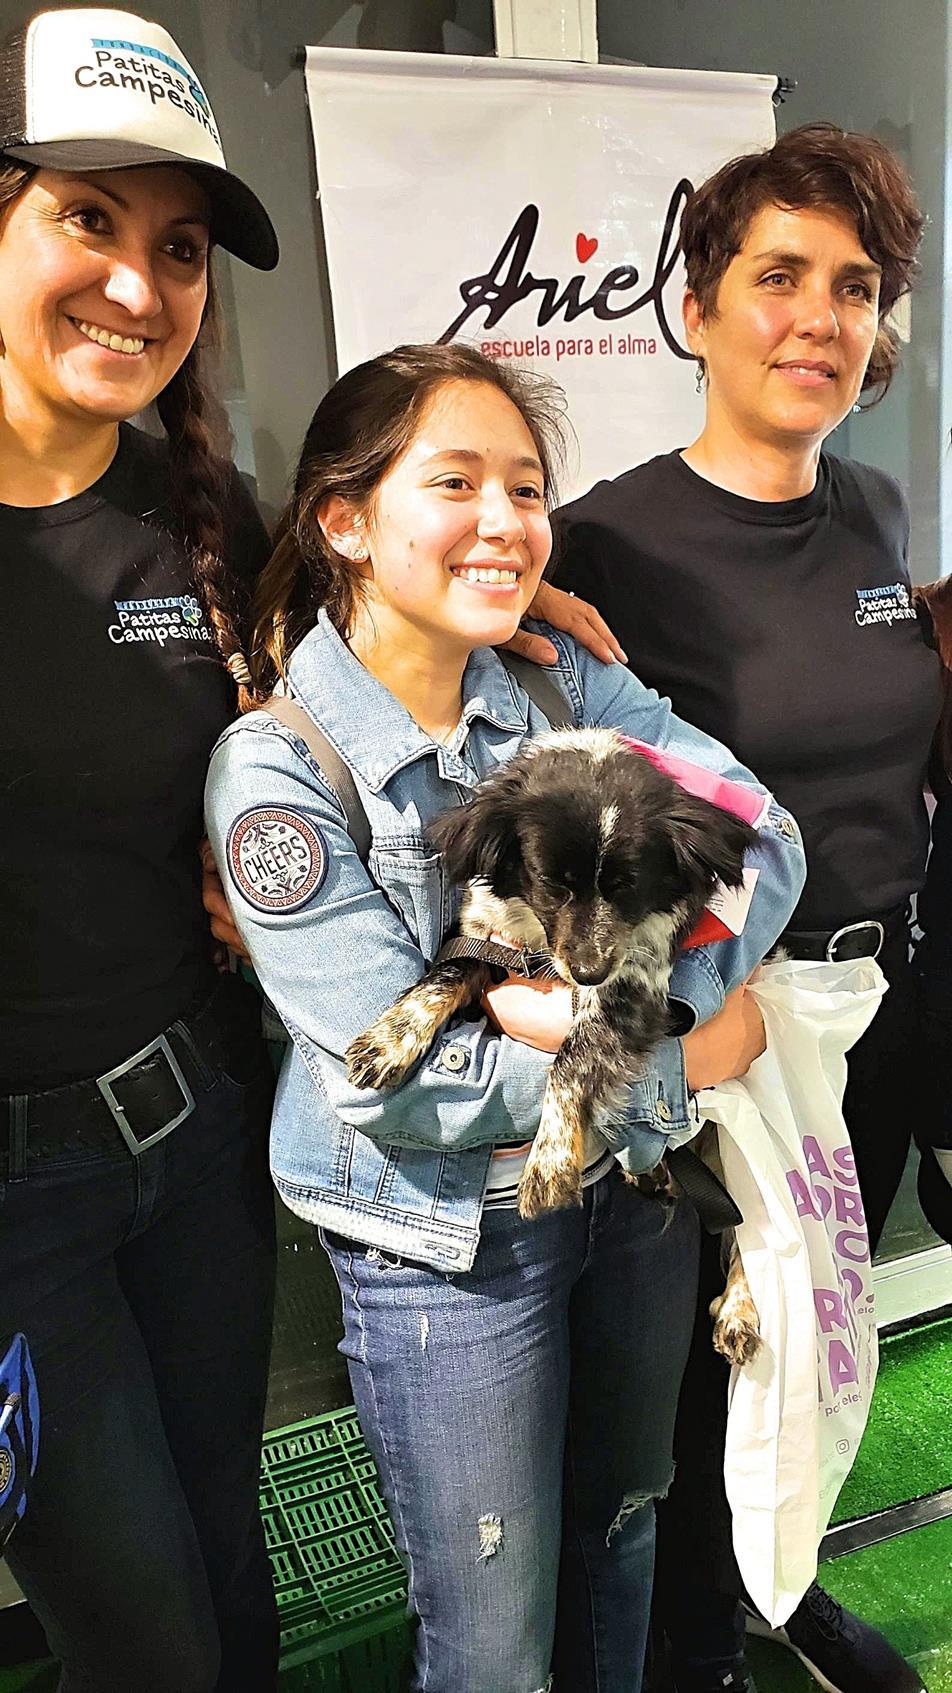 Hond adopteren Colombia Bogotá vrijwilligerswerk doen